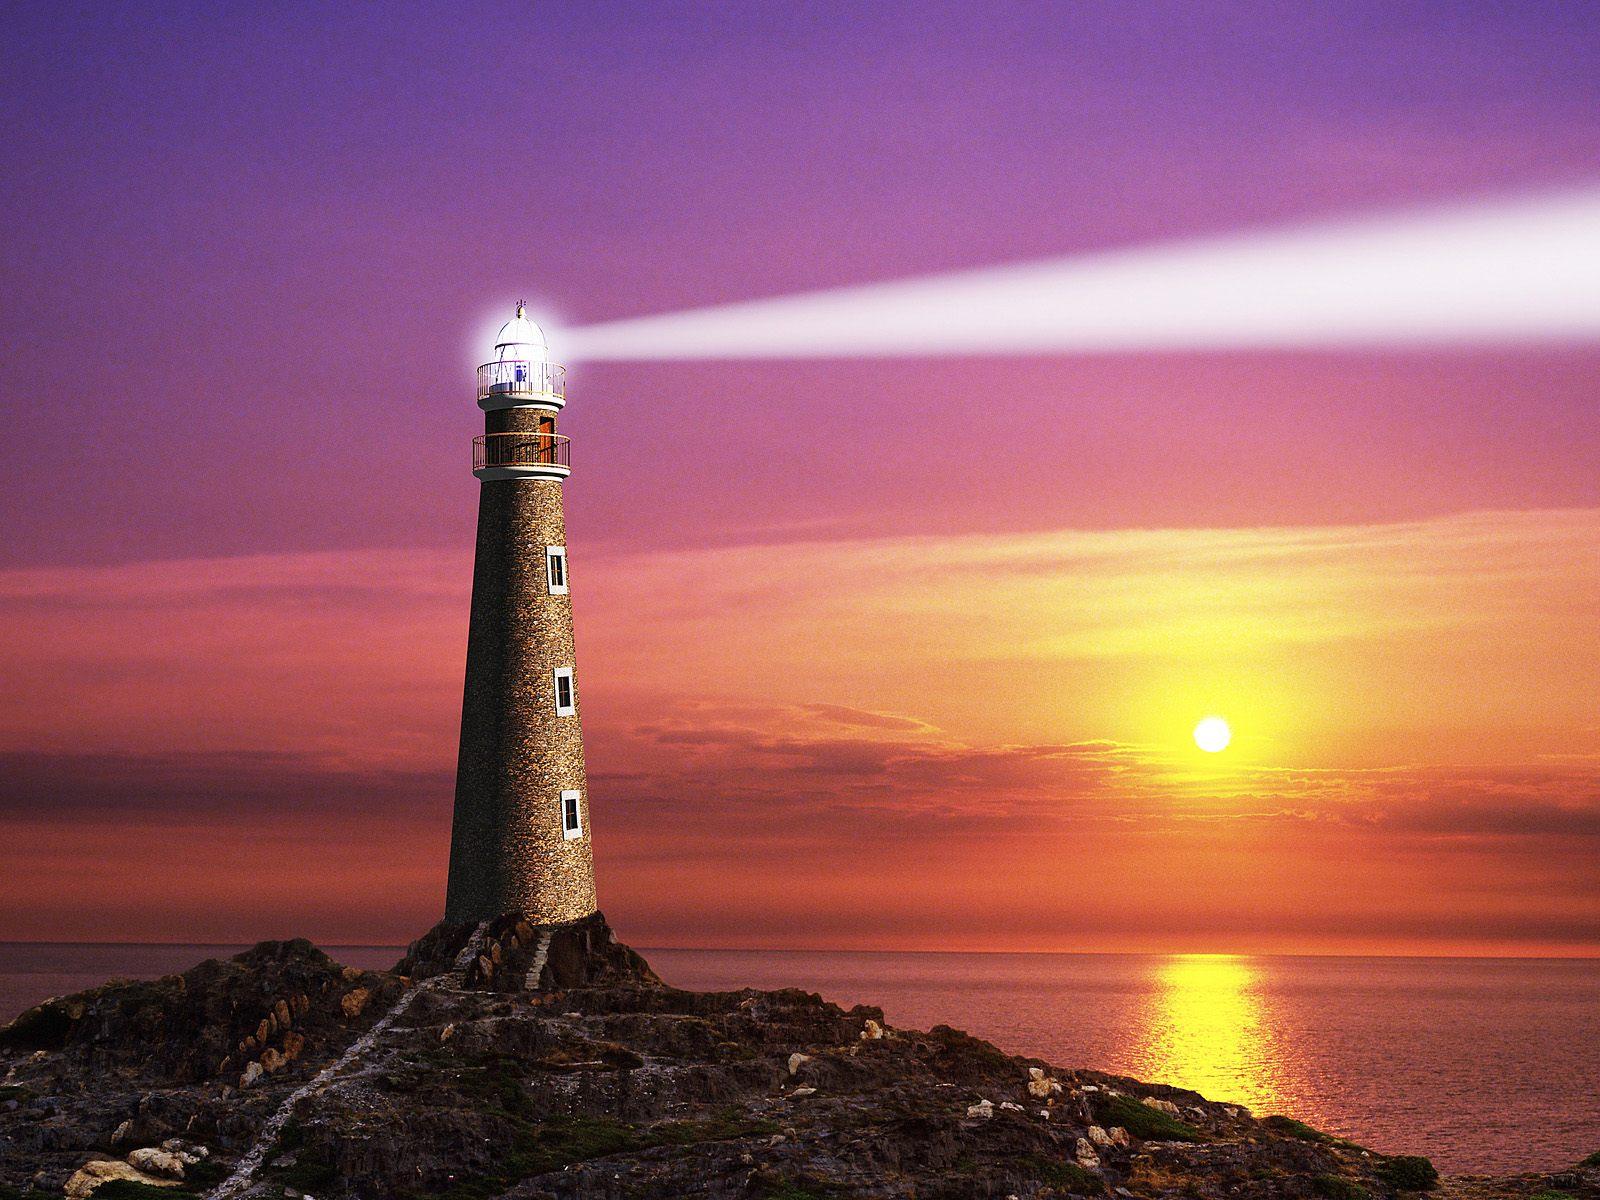 The Coastal Lighthouse   Computer Art Photography Desktop Wallpapers 1600x1200